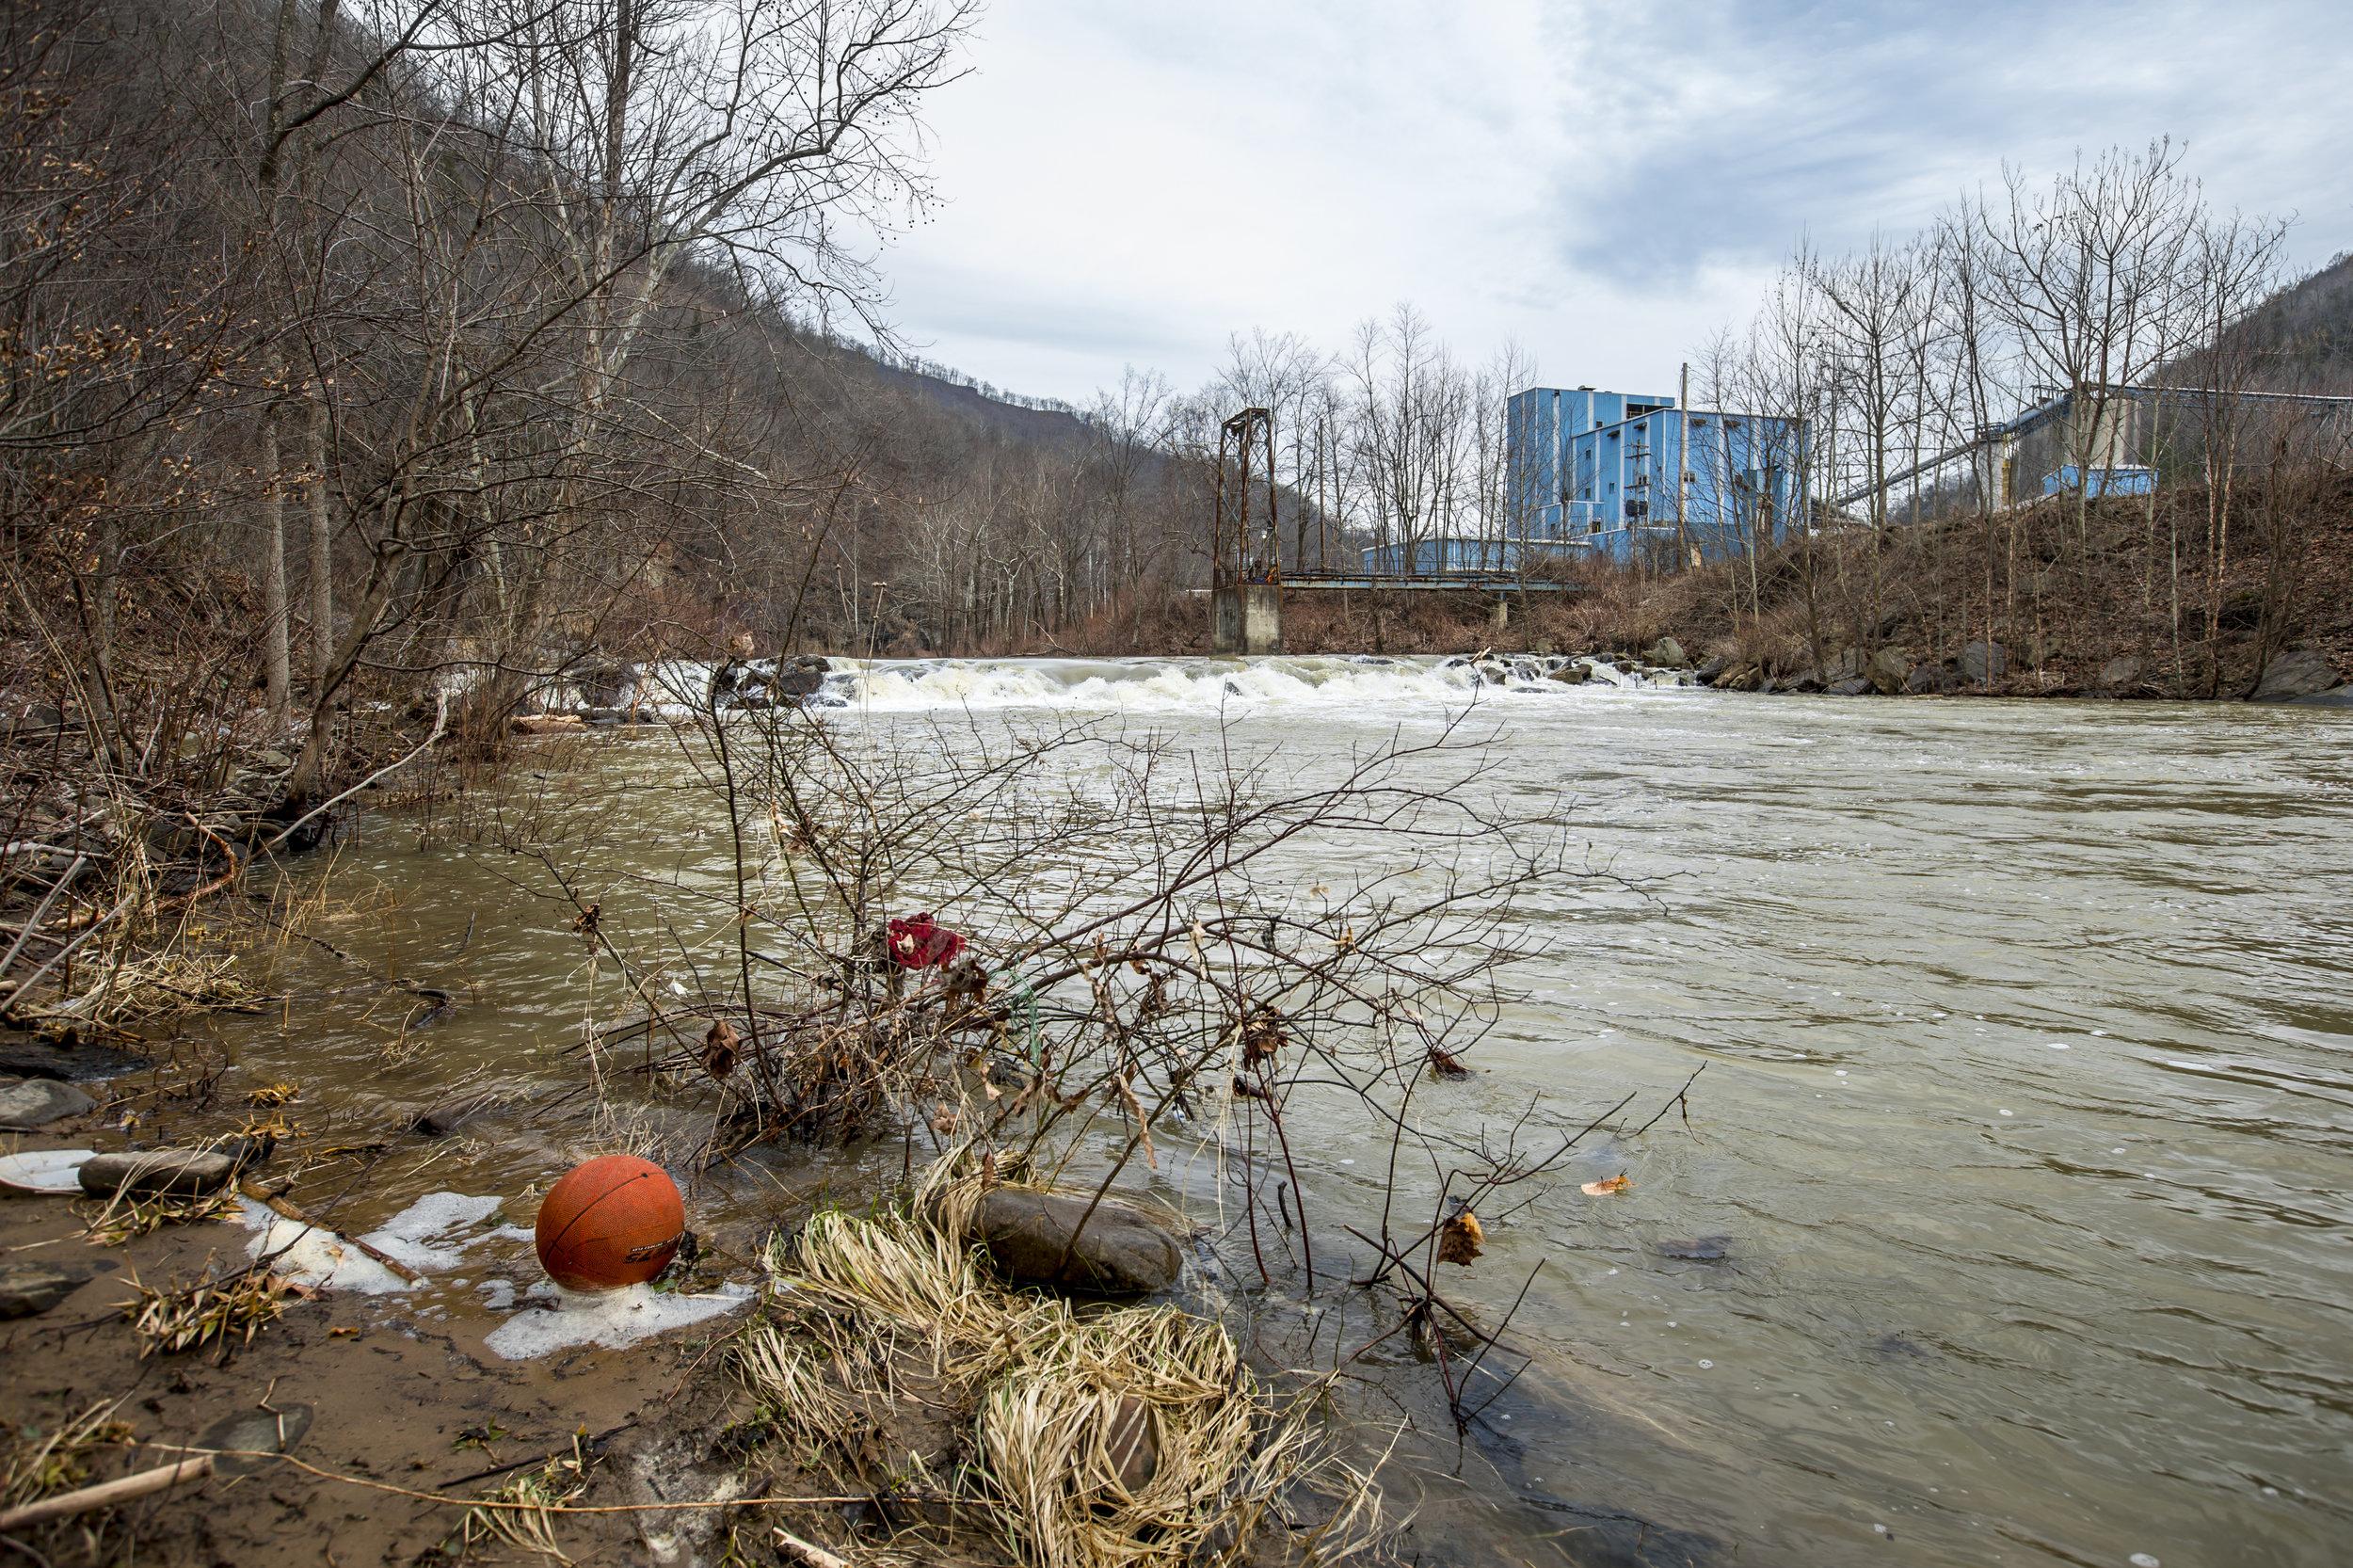 Coal Building and Landscape near Naoma, West Virginia, February 20, 2014.jpg